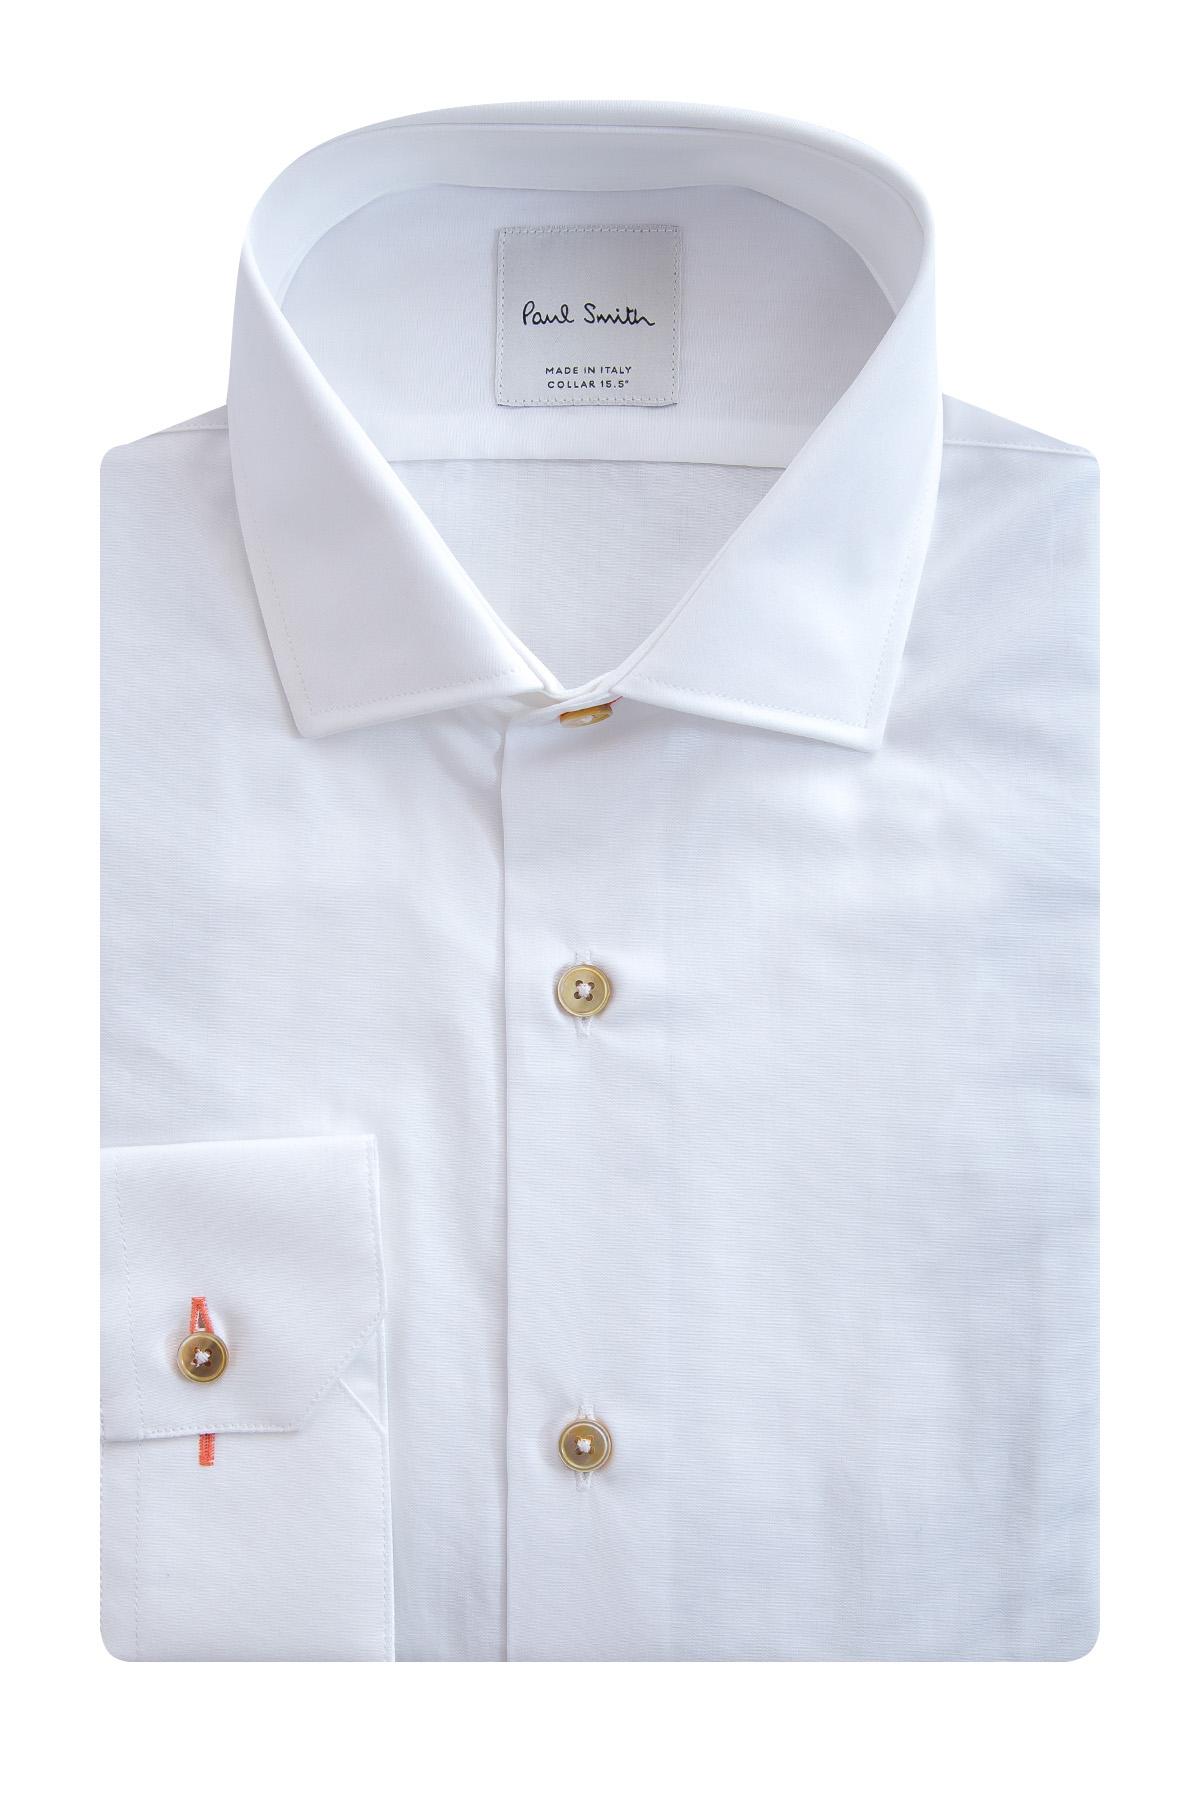 Купить Рубашка, PAUL SMITH, Италия, 100% хлопок